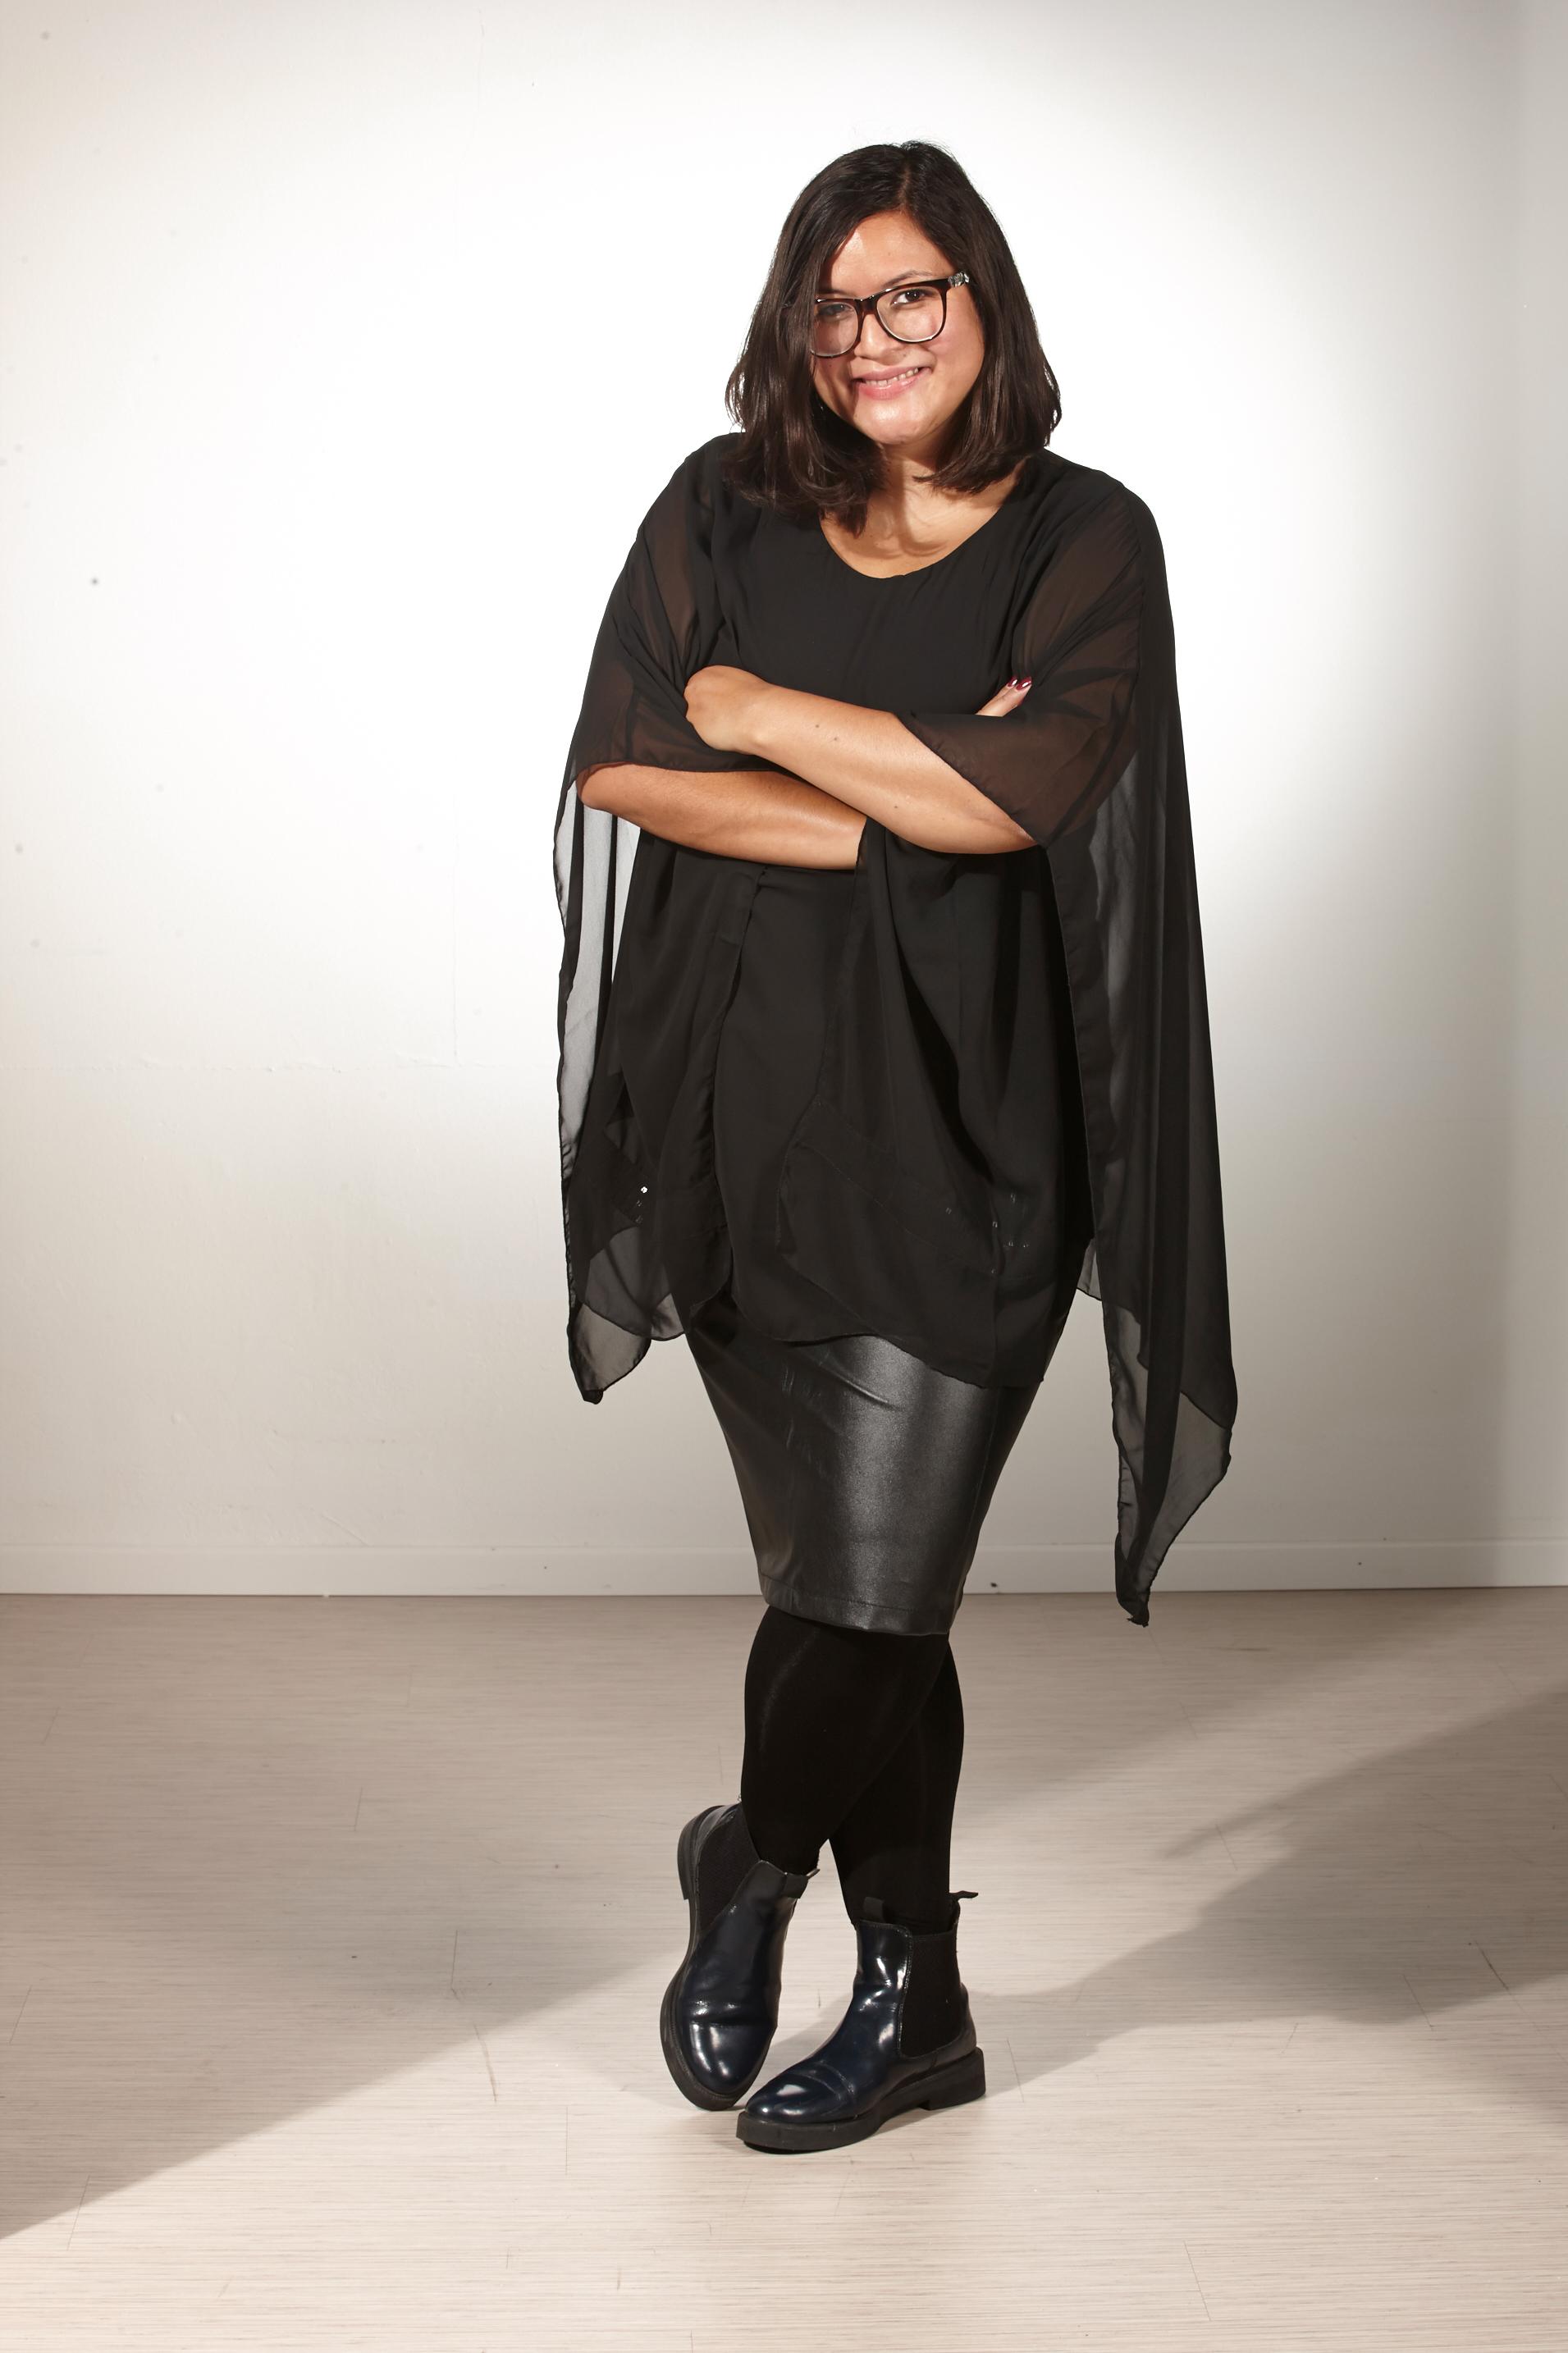 fa0a450b36d7 Mode große Größen - Plus Size Outfit-Tipps - INCURVY Plus-Size ...